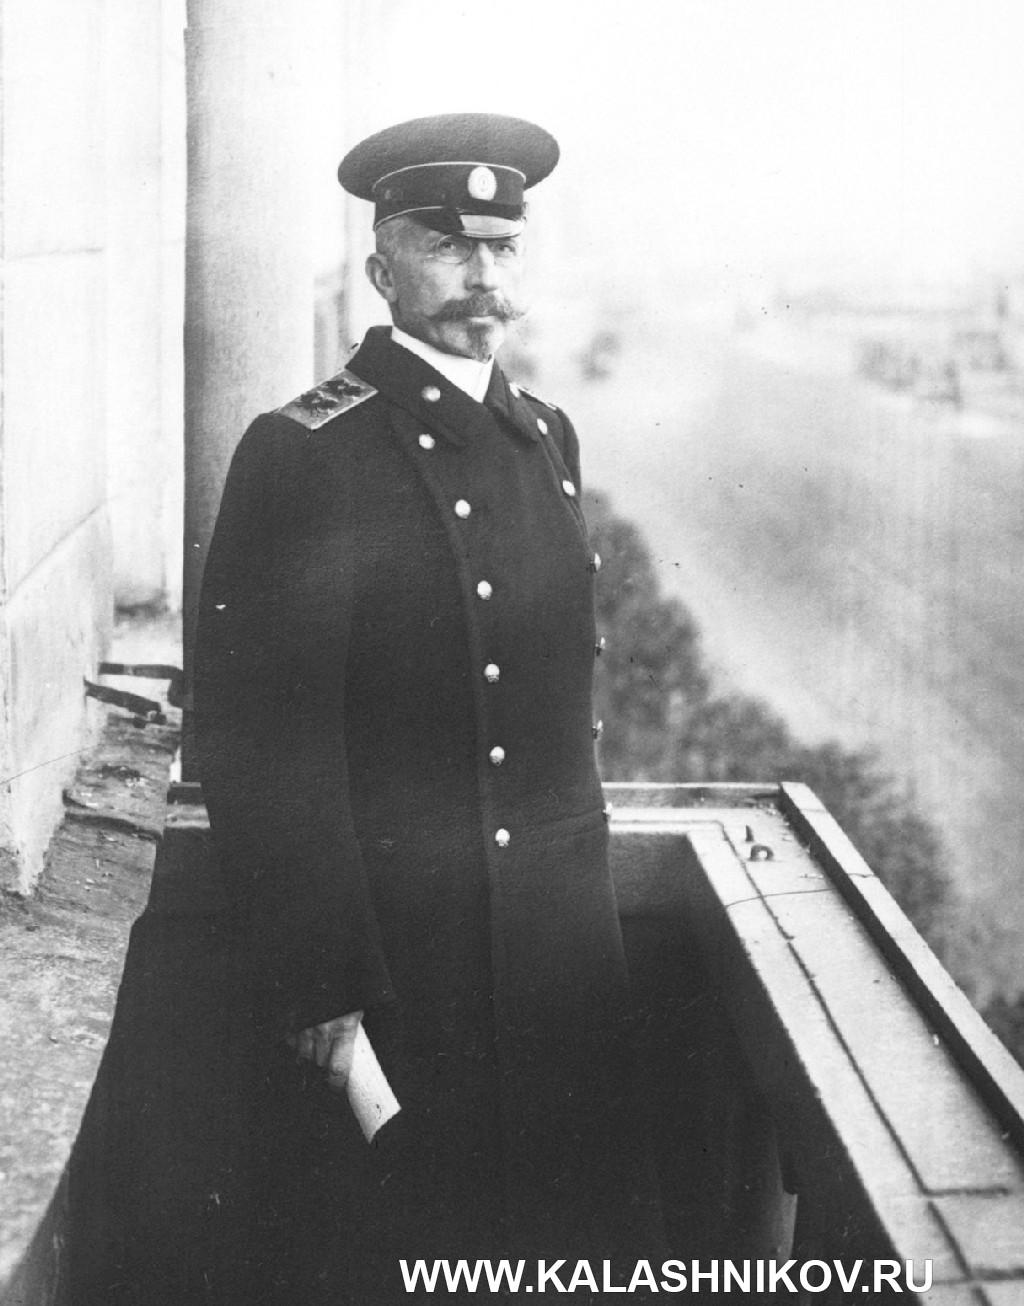 Вице-адмирал А. И. Русин